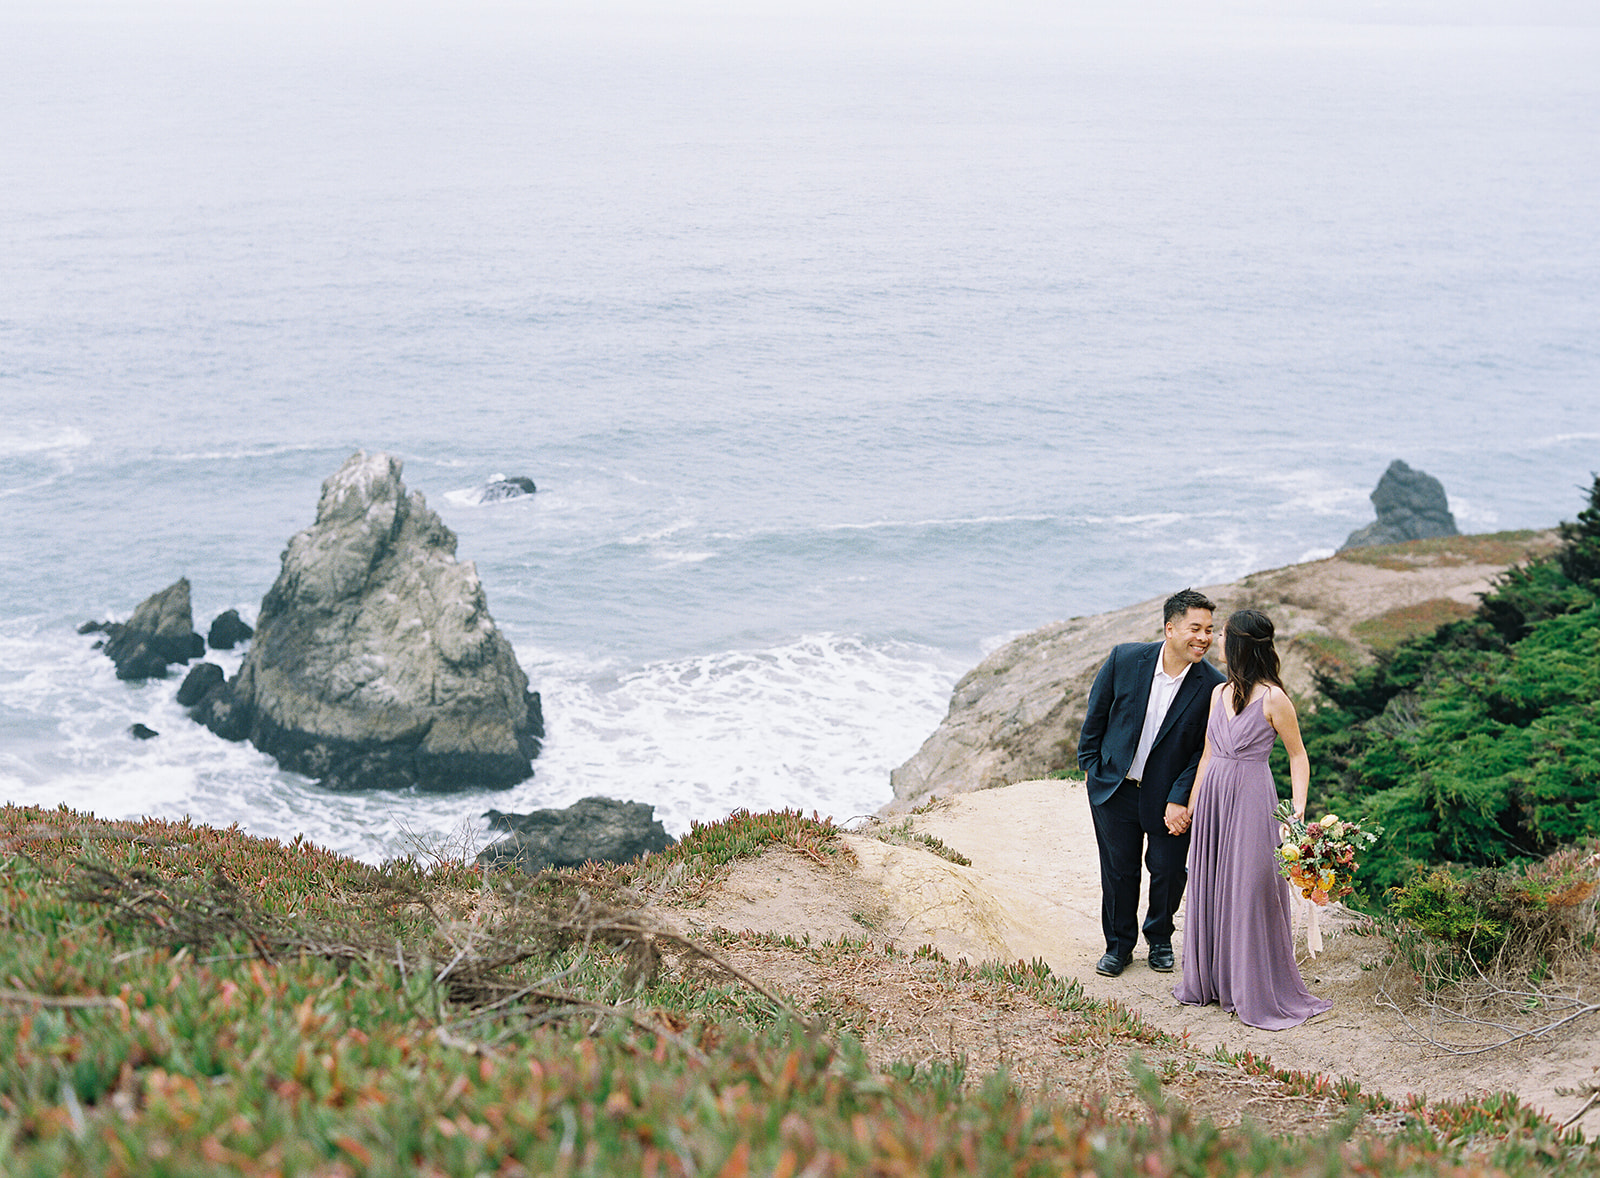 Nathalie_Cheng_Photography_Anniversary_Frances___Patrick_101.jpg